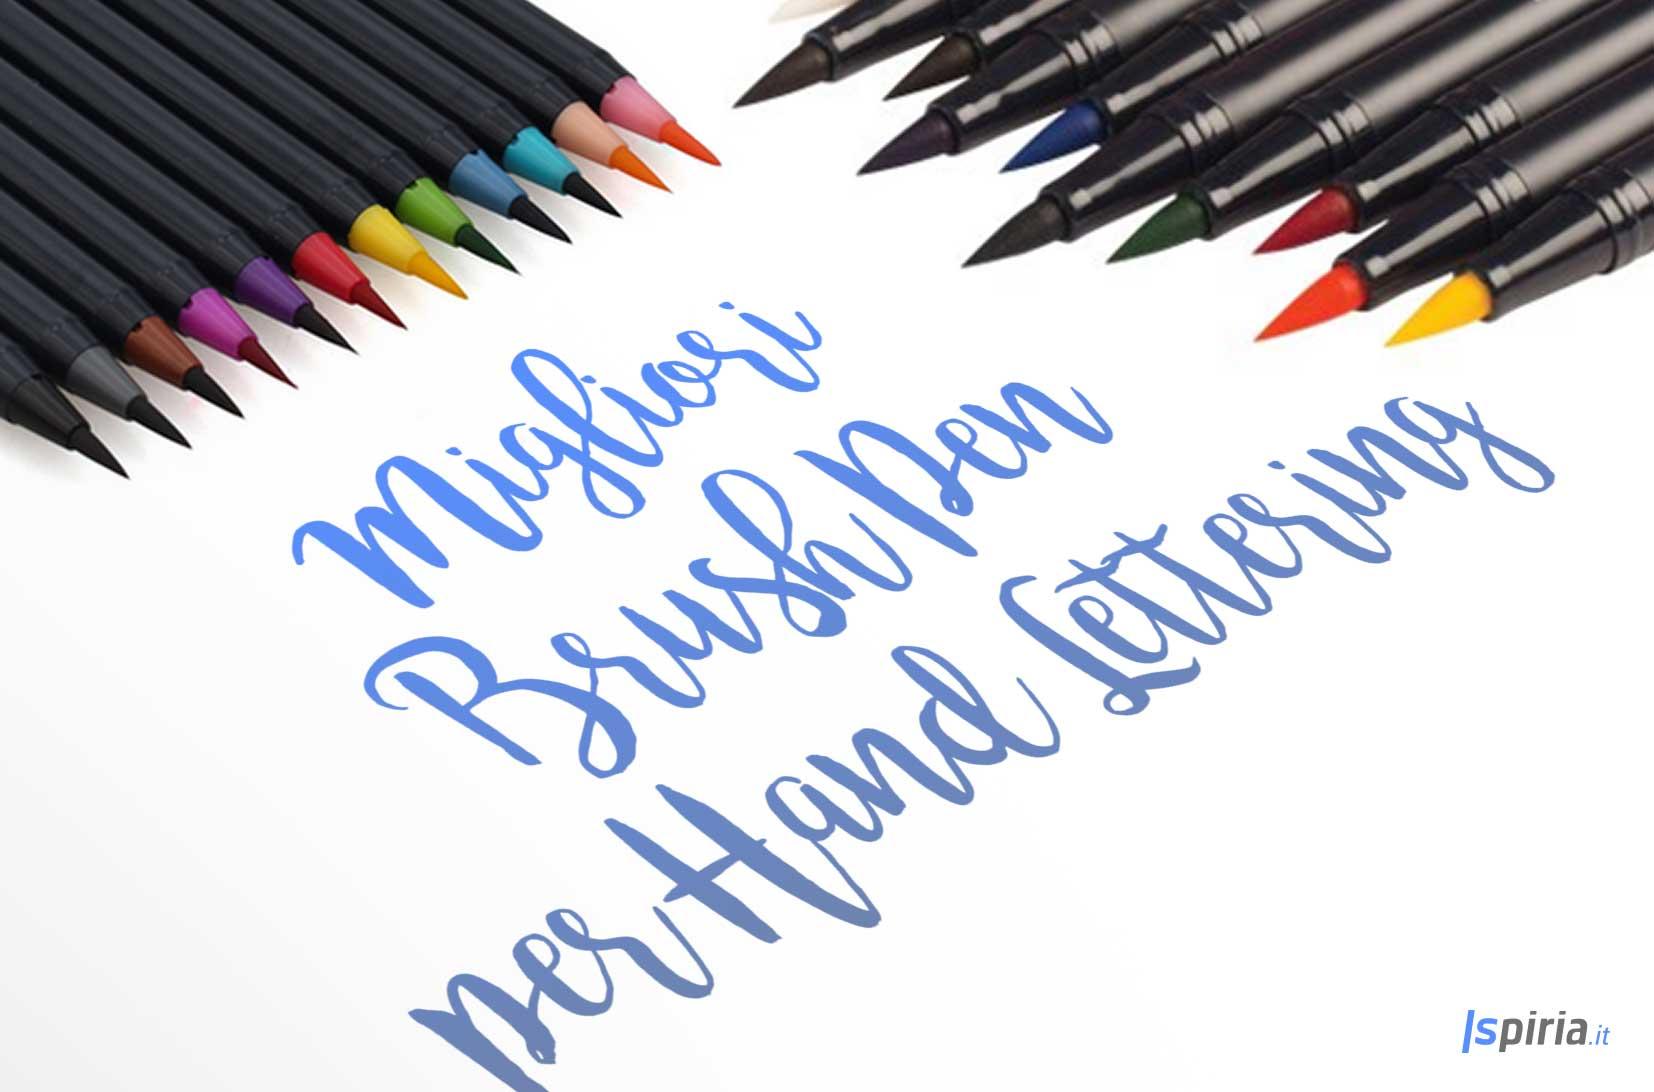 migliori-brush-pen-lettering